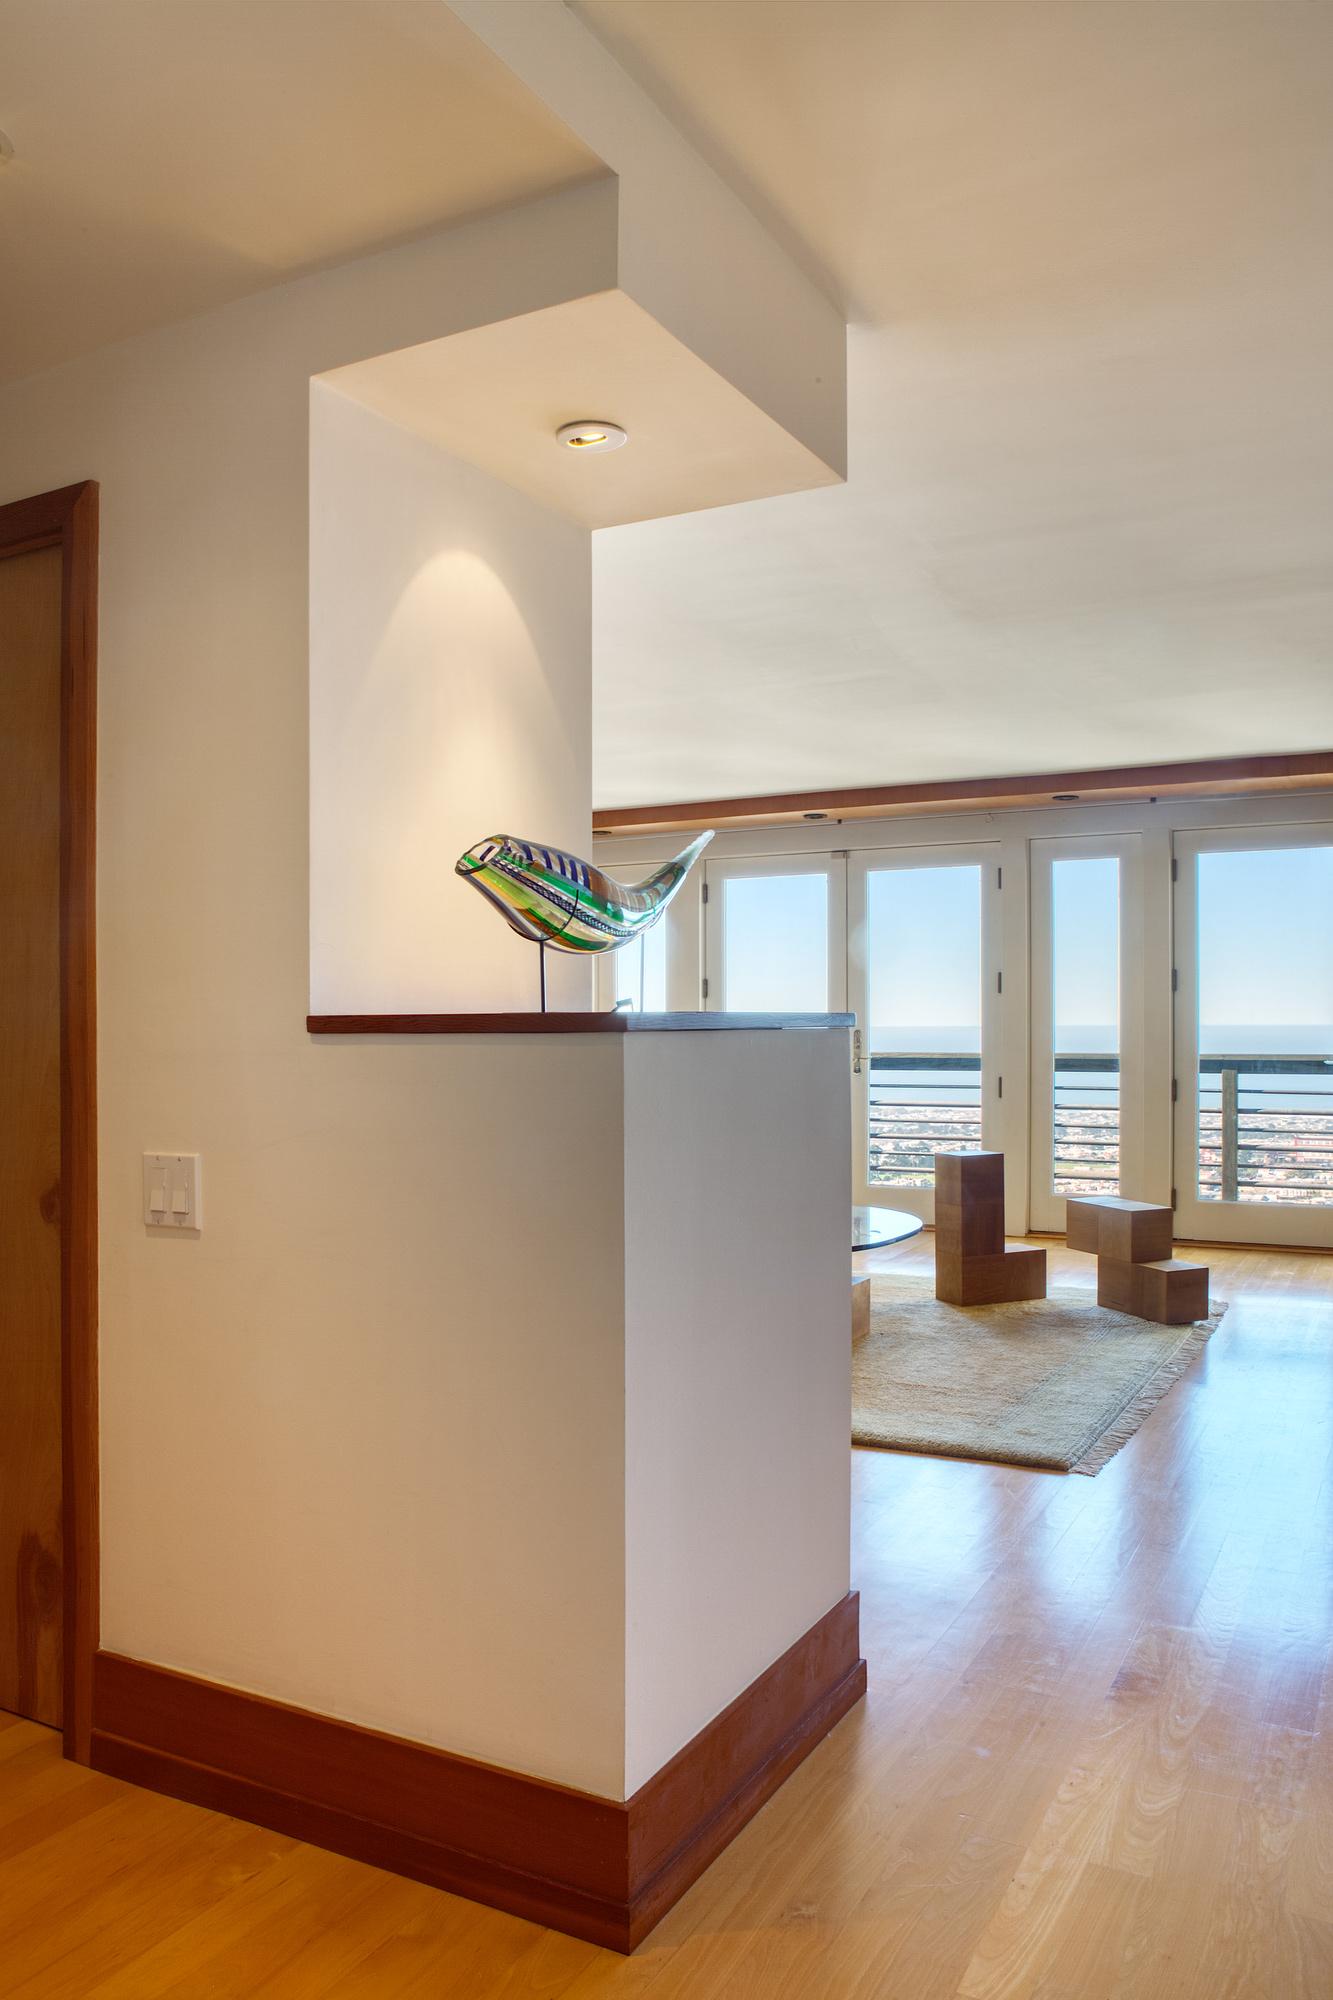 Kaplan-Architects-San Francisco-remodel-art-niche.jpg